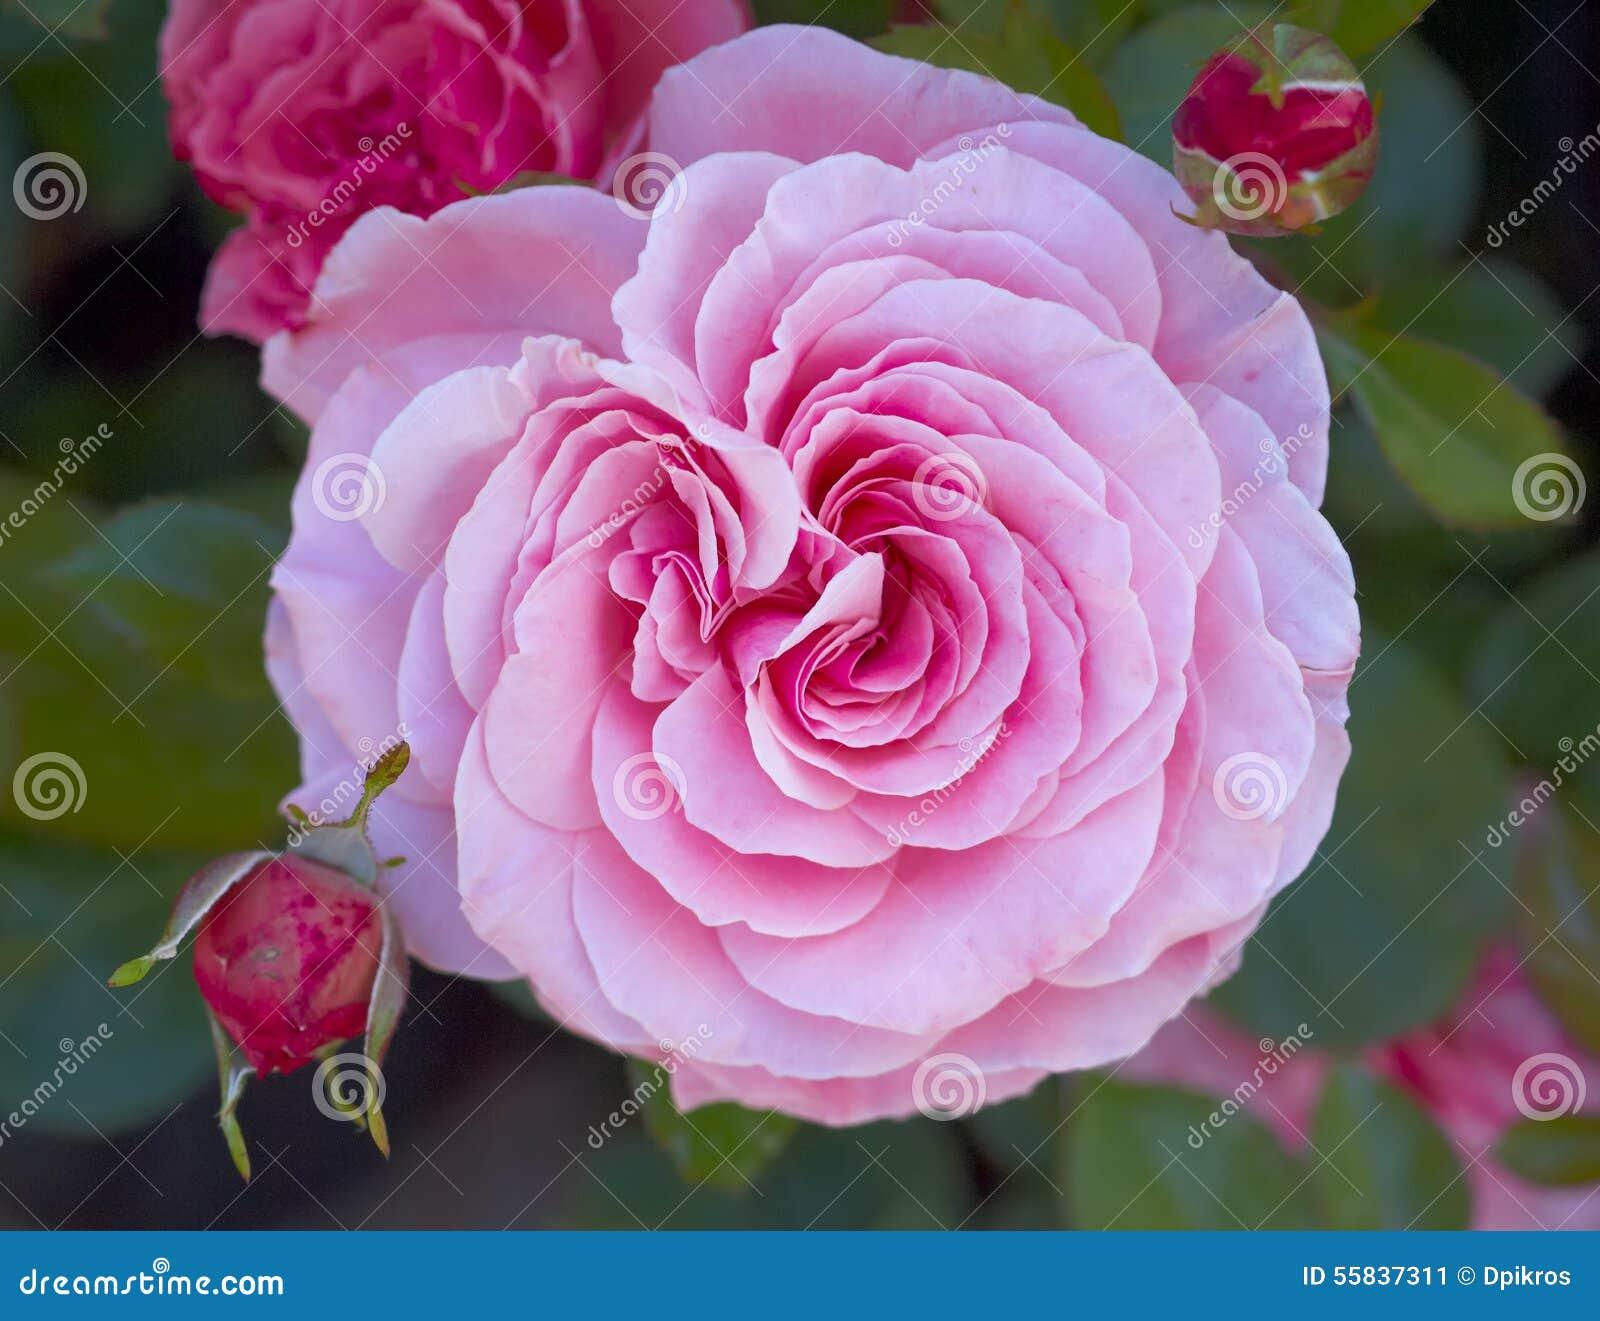 Light pink rose flower close up stock image image of freshness download light pink rose flower close up stock image image of freshness decoration mightylinksfo